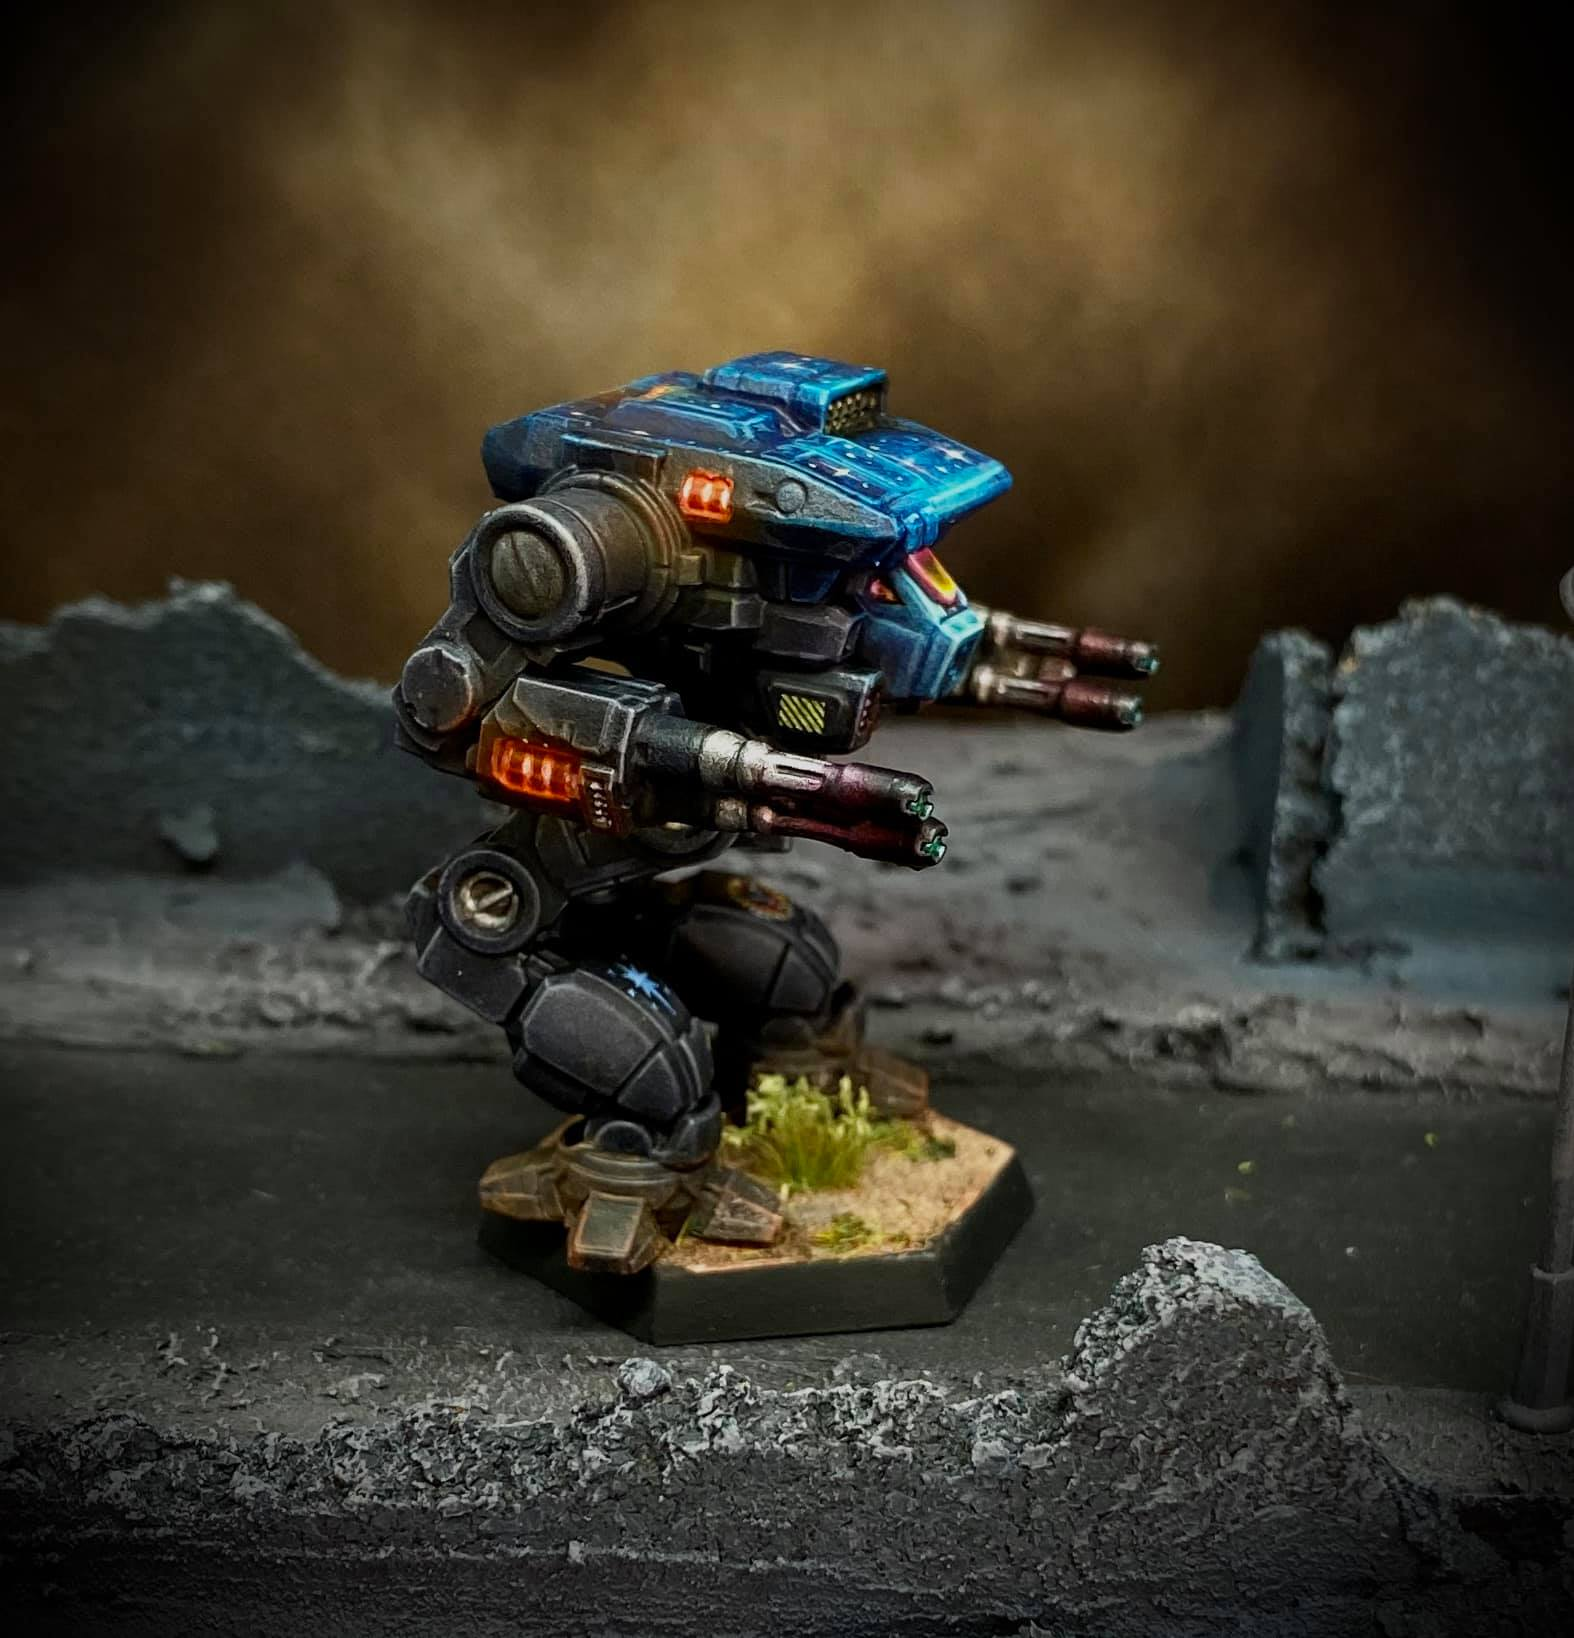 Warhawk Prime